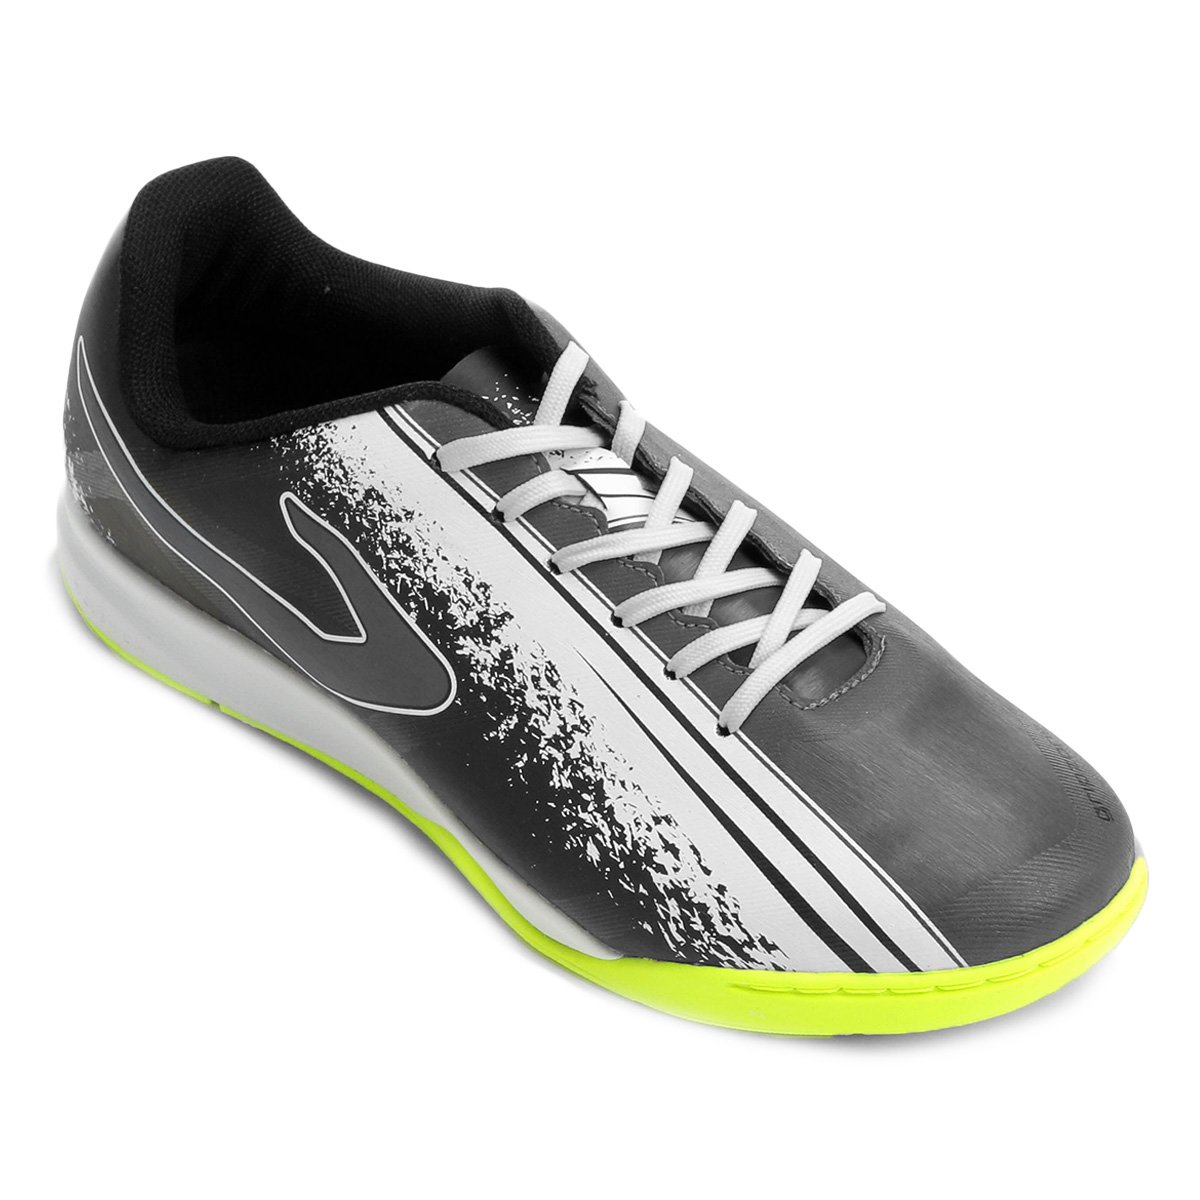 142adf3ee2 Chuteira Futsal Topper Trivela